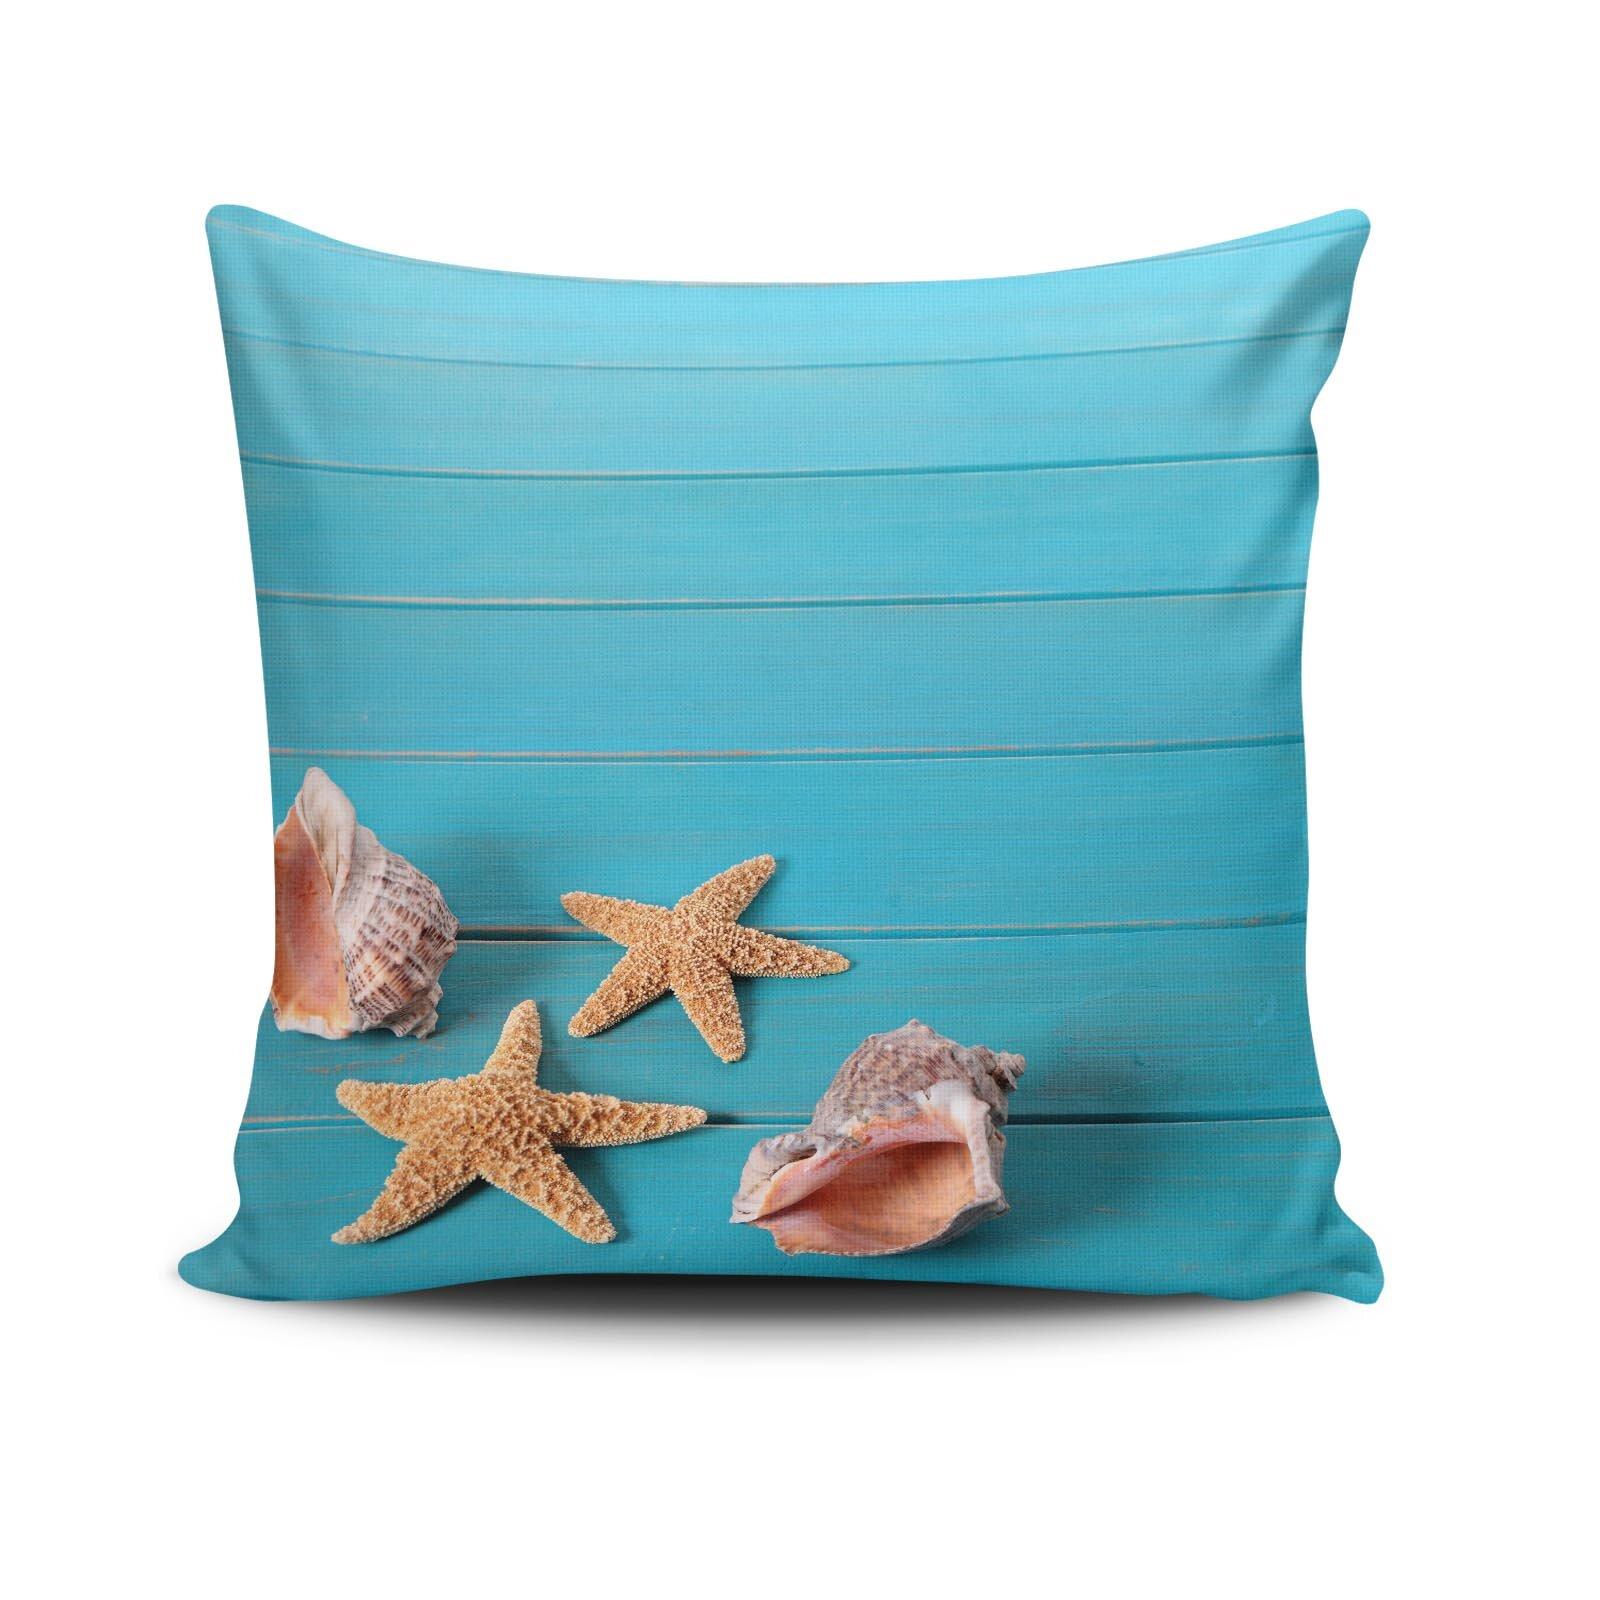 Perna decorativa Cushion Love, Dimensiune: 45 x 45 cm, Material exterior: 50% bumbac / 50% poliester 768CLV0204